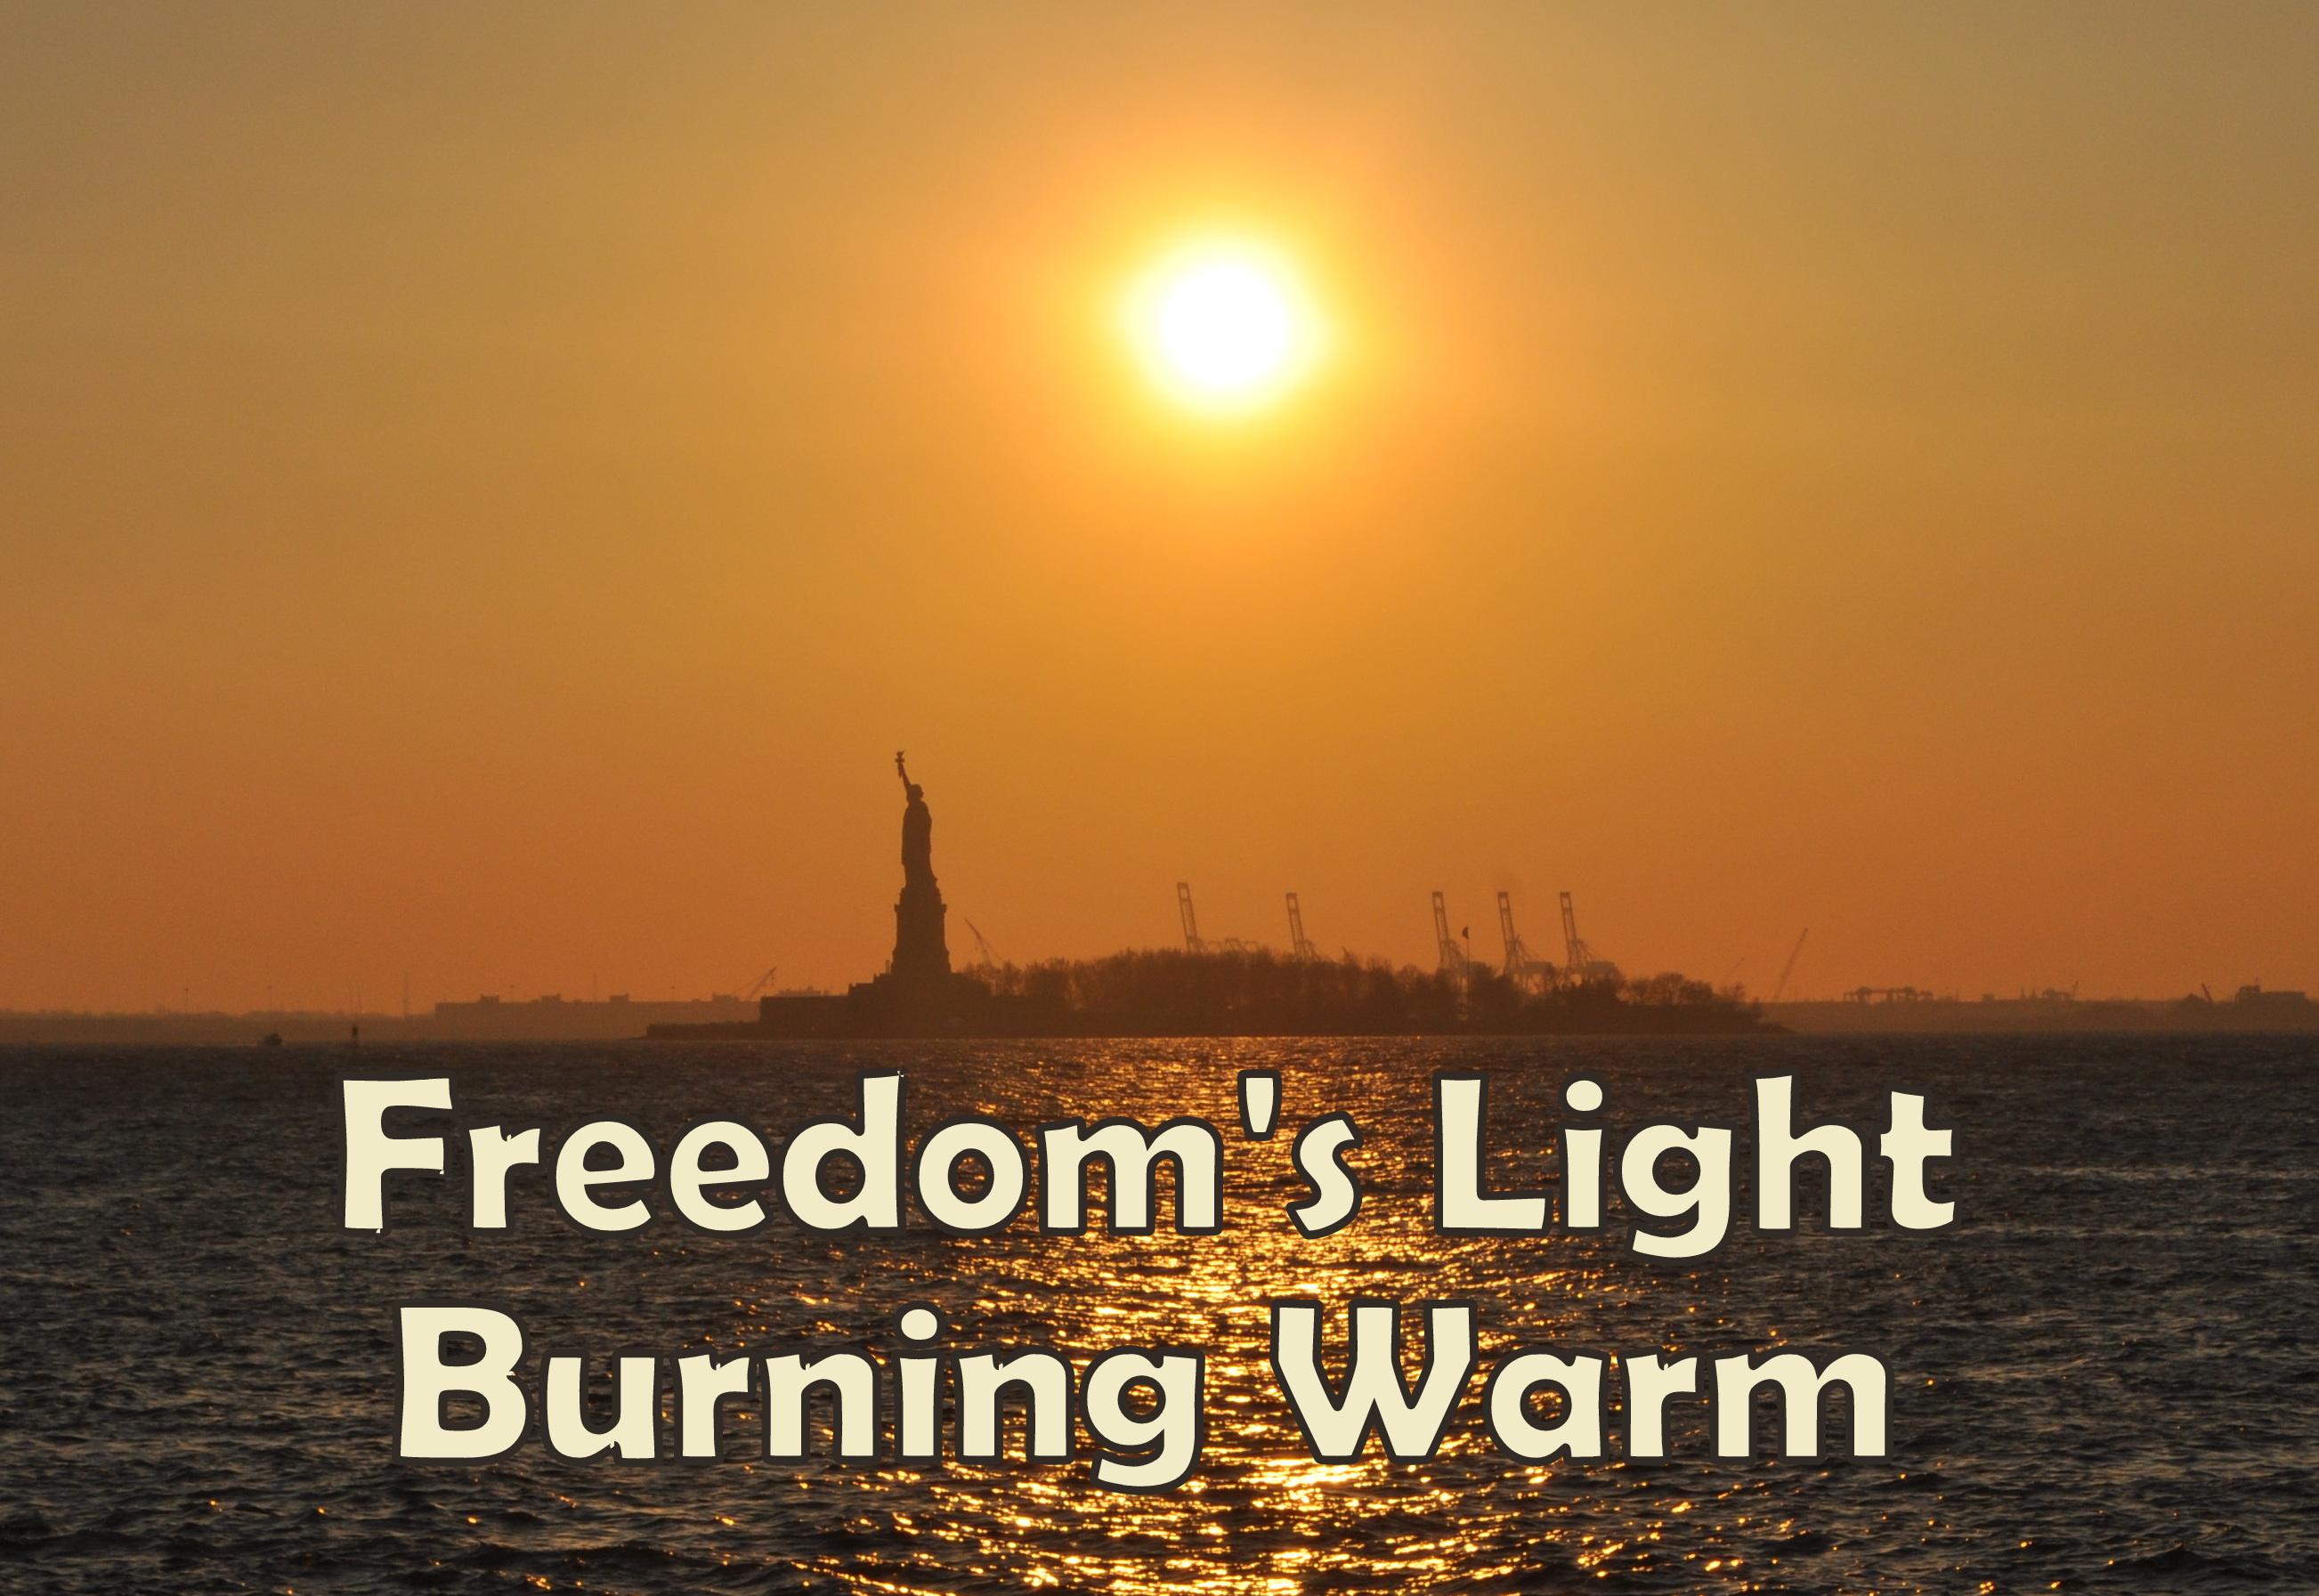 Freedom's Light Burning Warm